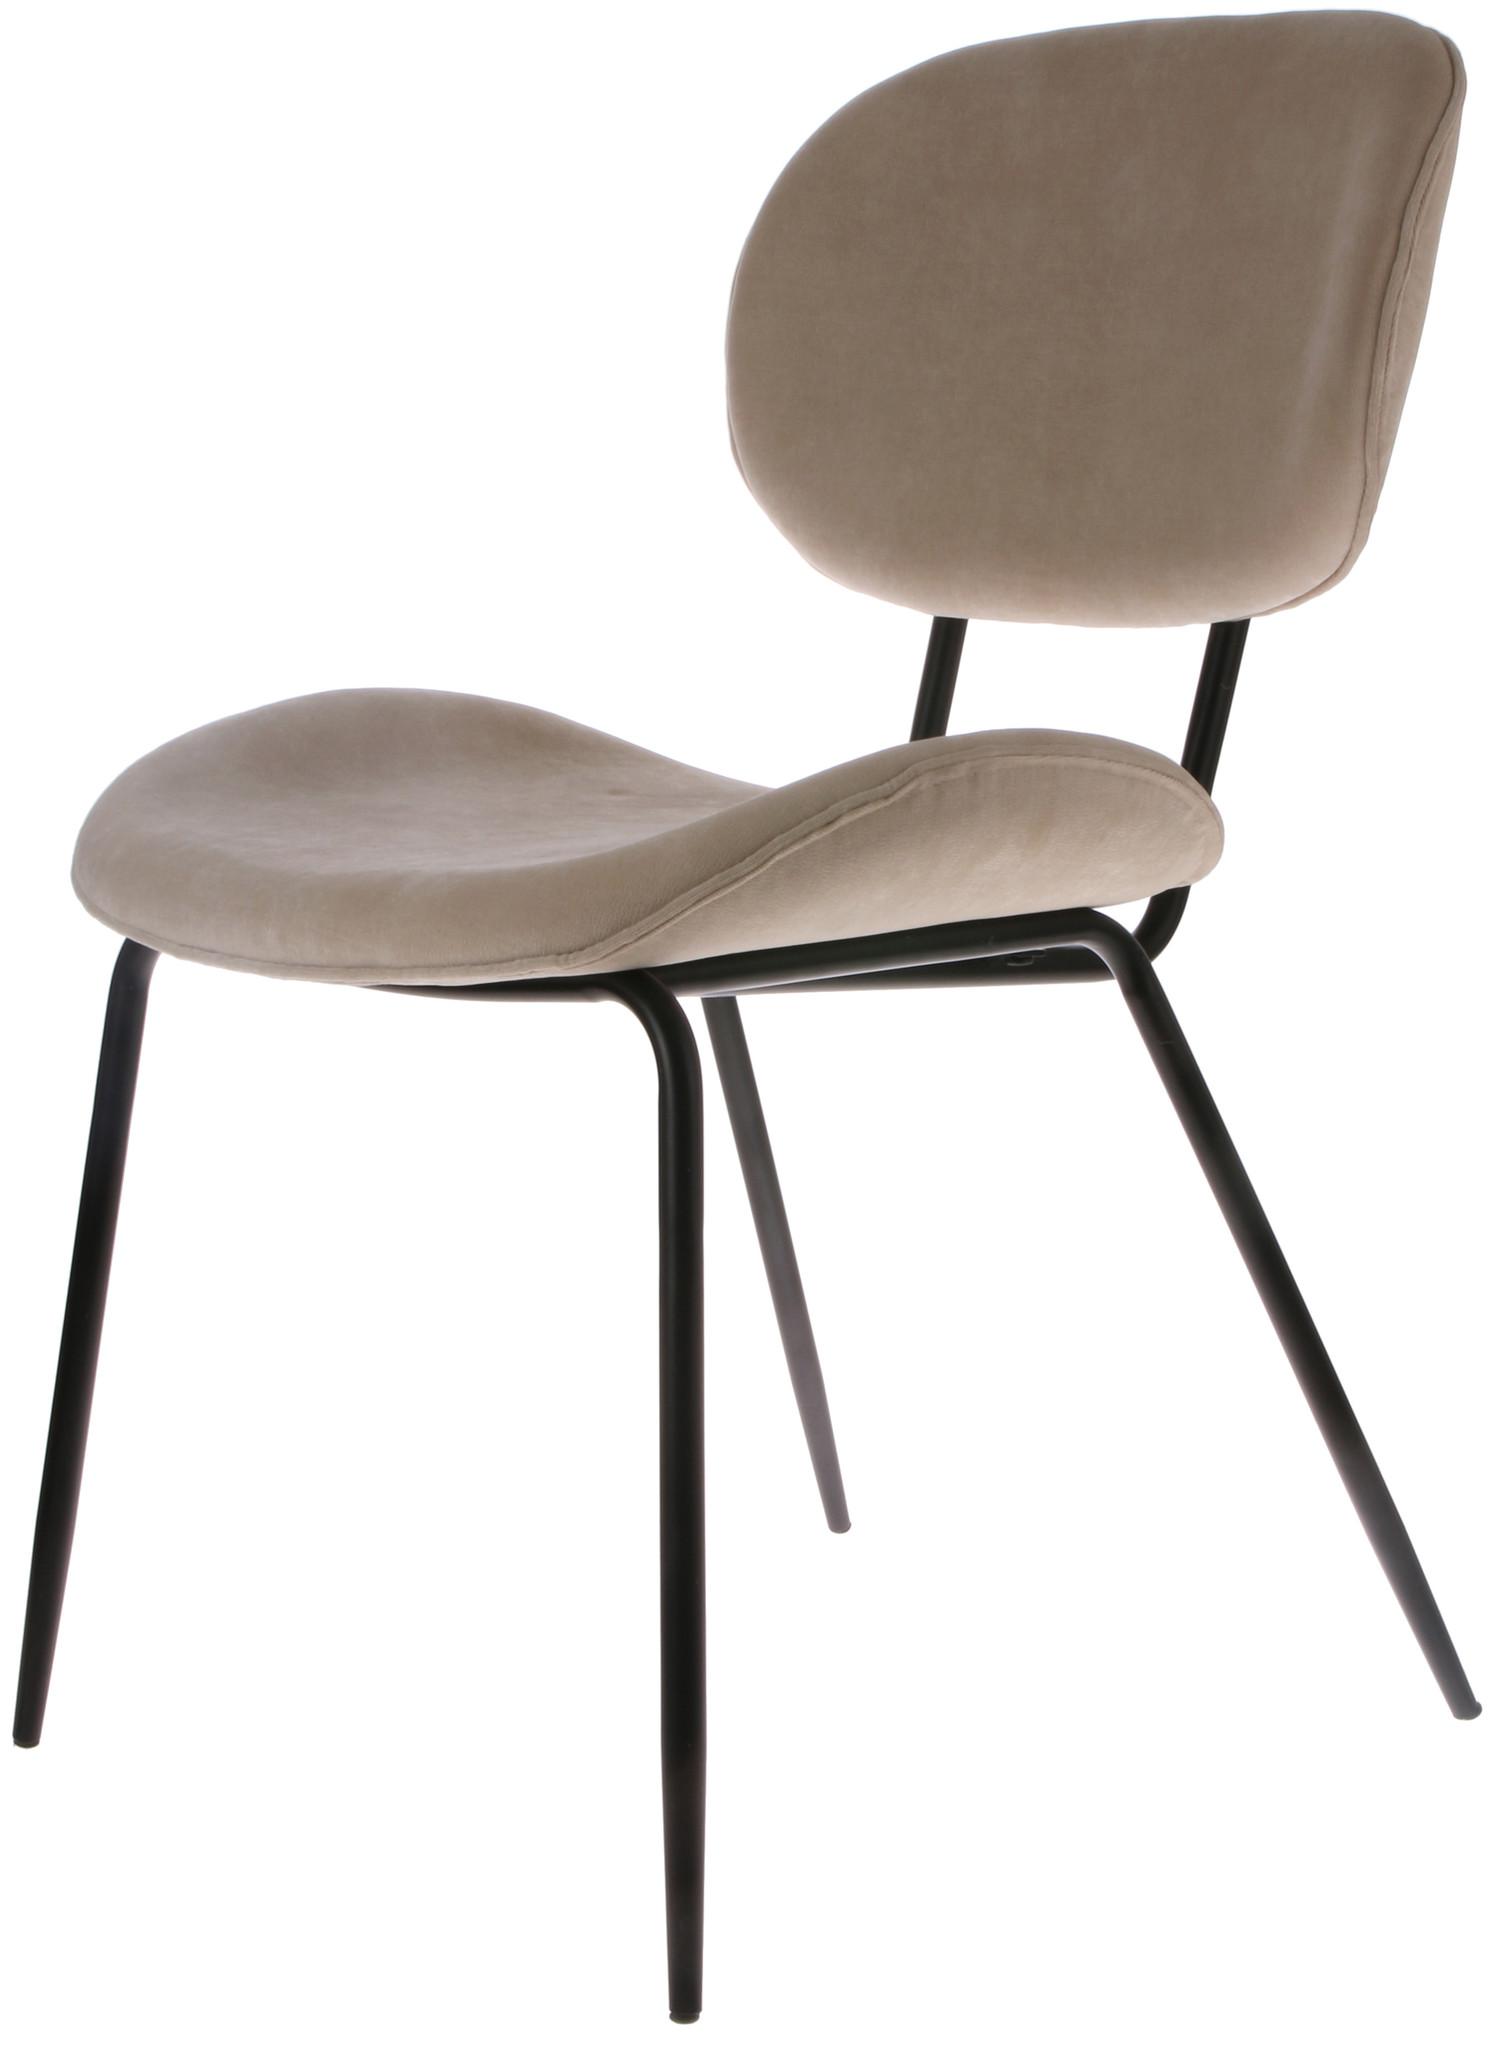 Stoel dining chair rib crème-1